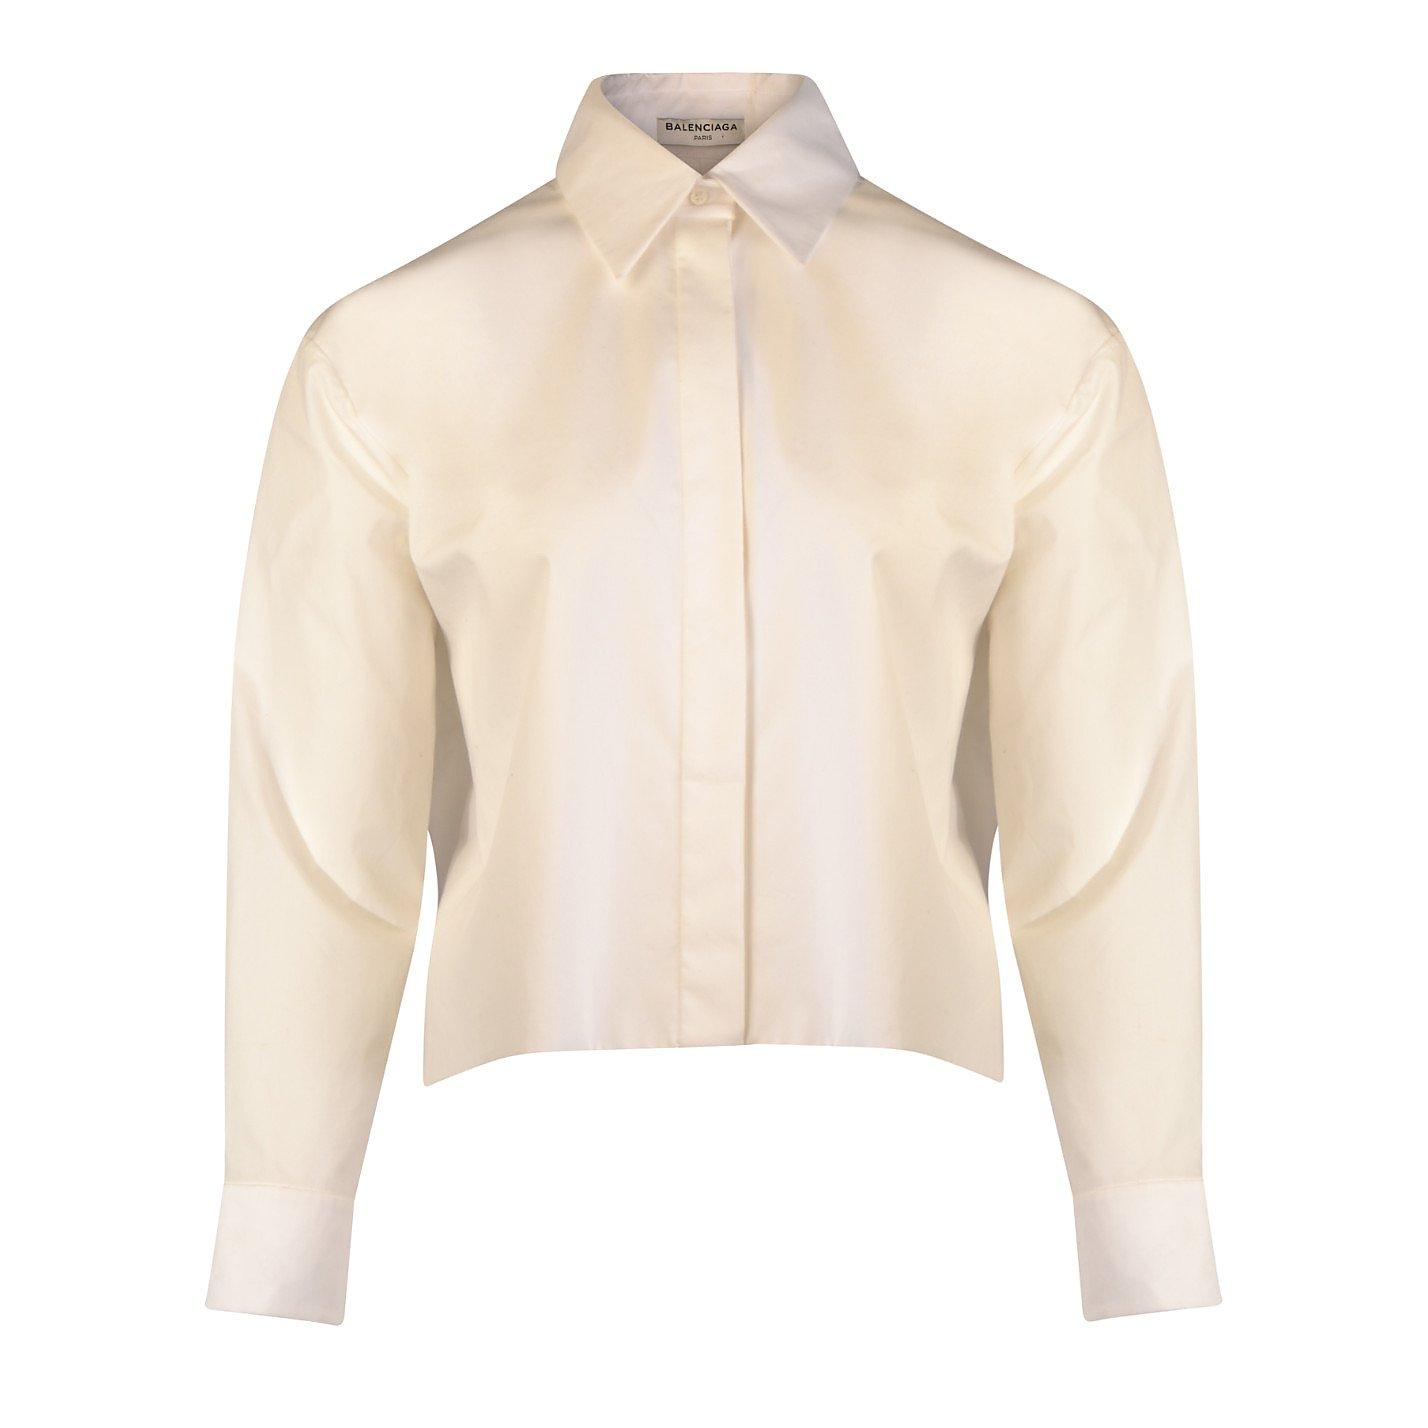 Balenciaga Cropped Belted Shirt